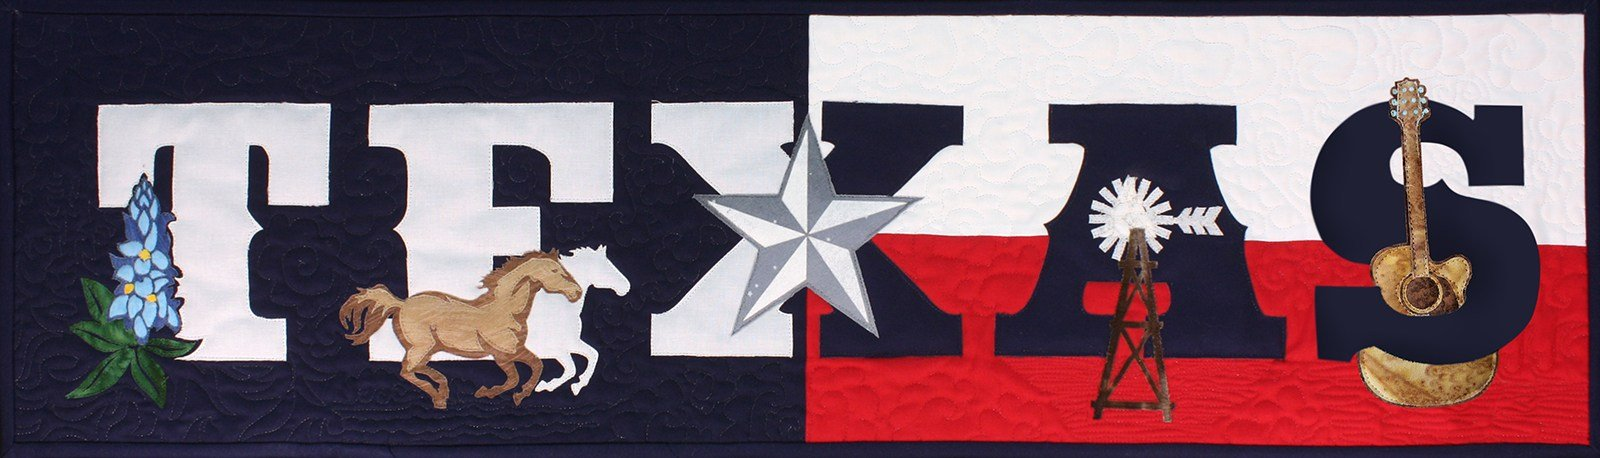 State Pride Texas Laser-cut Applique Kit